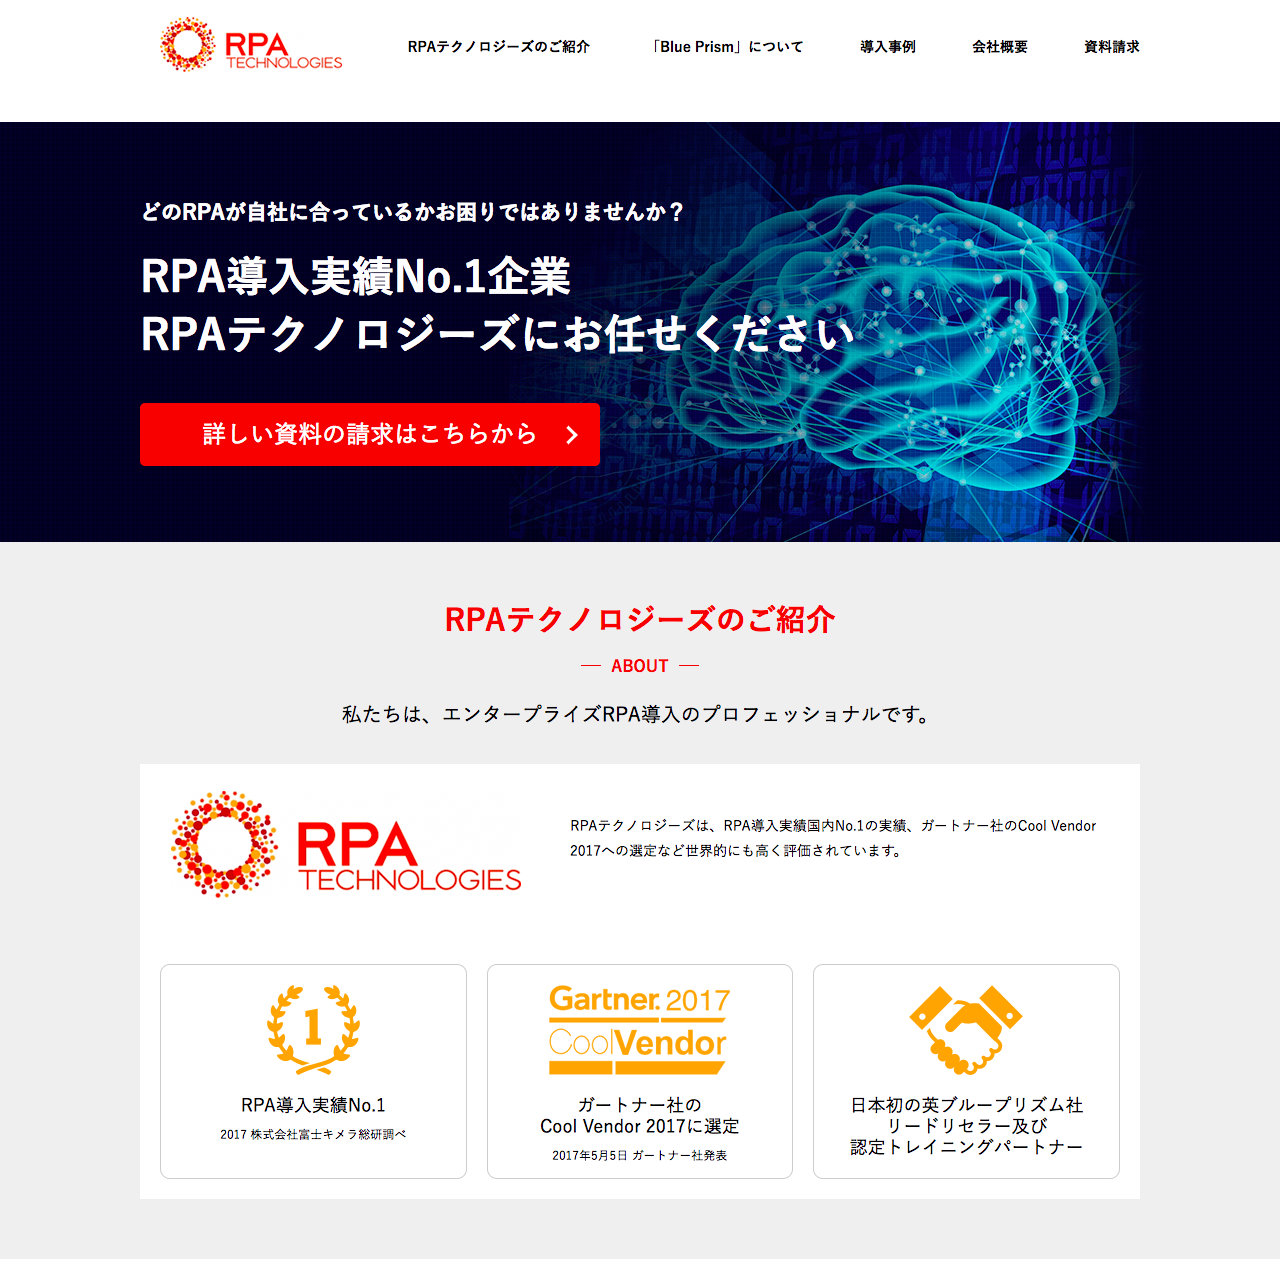 Blue Prismエンタープライズ RPA導入サービス